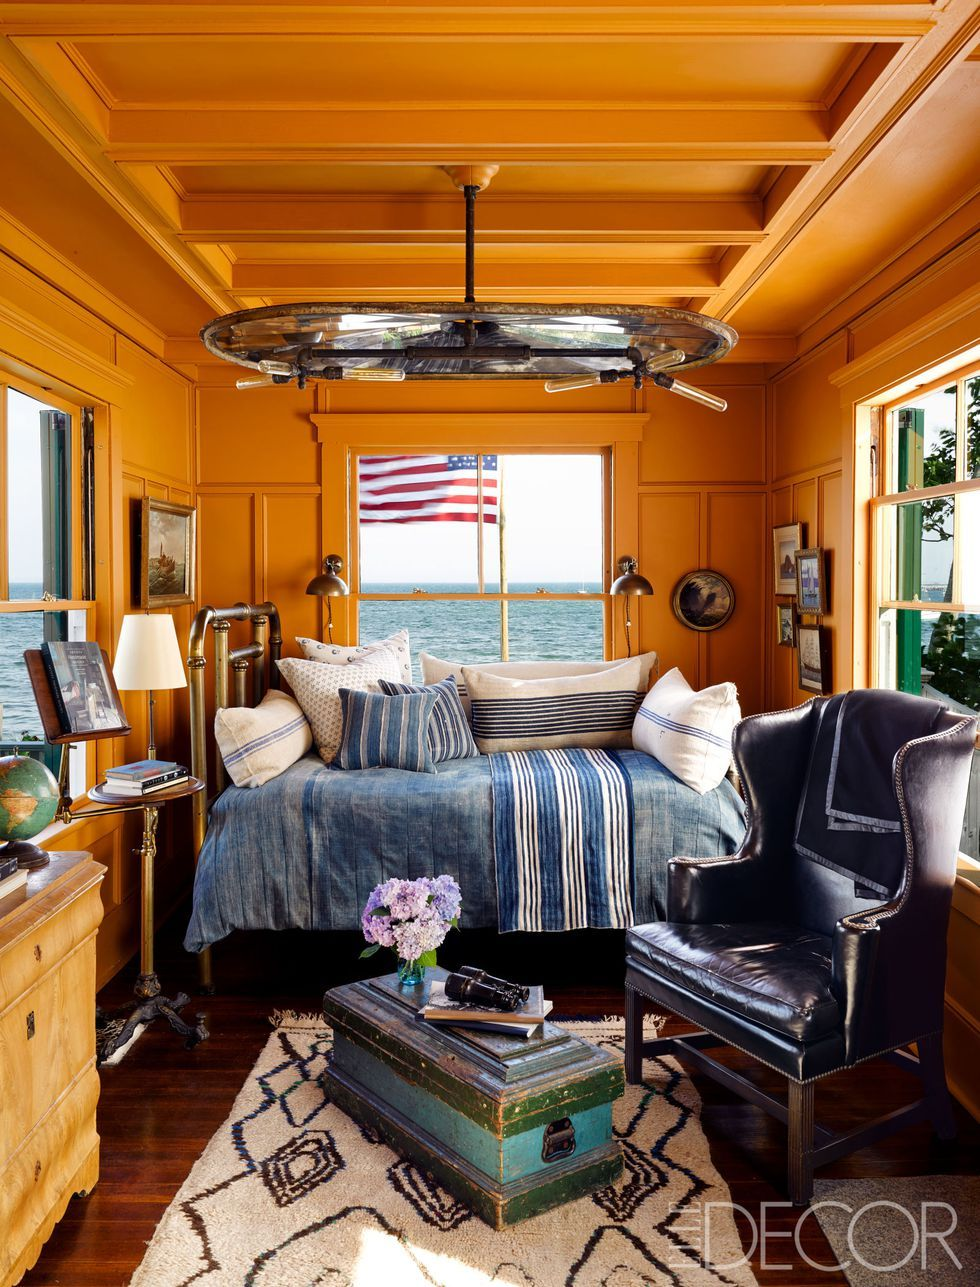 Orange Room Ideas & 15 Best Orange Paint Colors for Your Home - Orange Room Decor Ideas